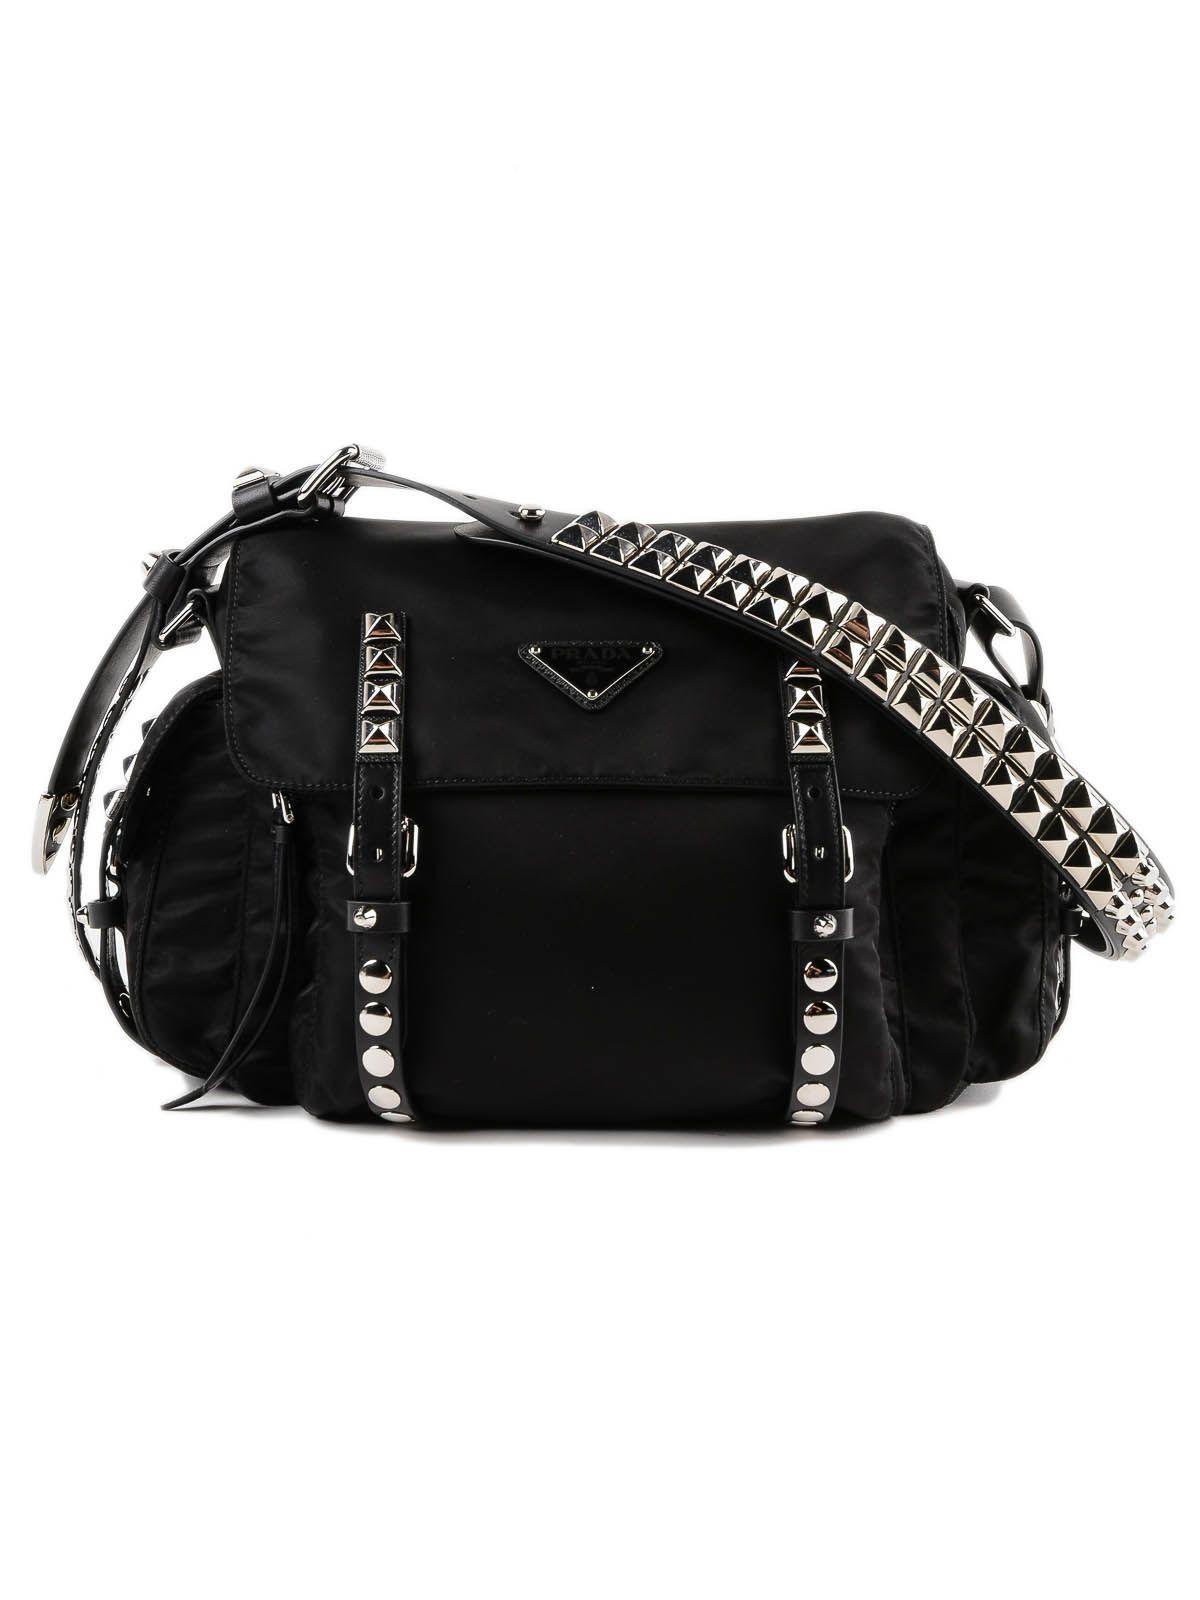 0219b43b582a Prada New Vela Shoulder Bag In Nero | ModeSens